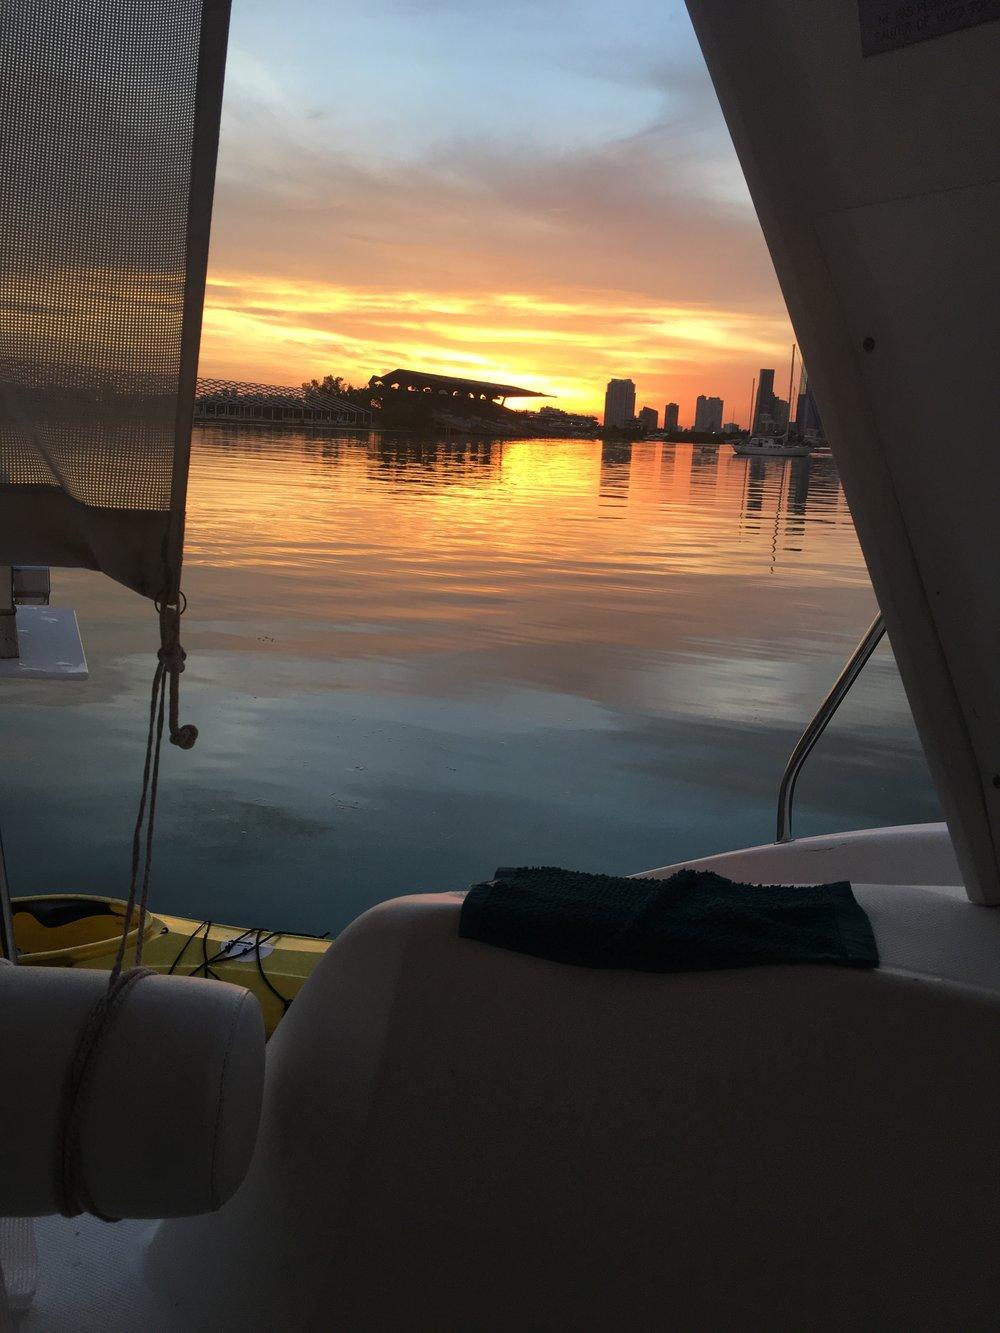 A Marine Stadium and Miami sunset